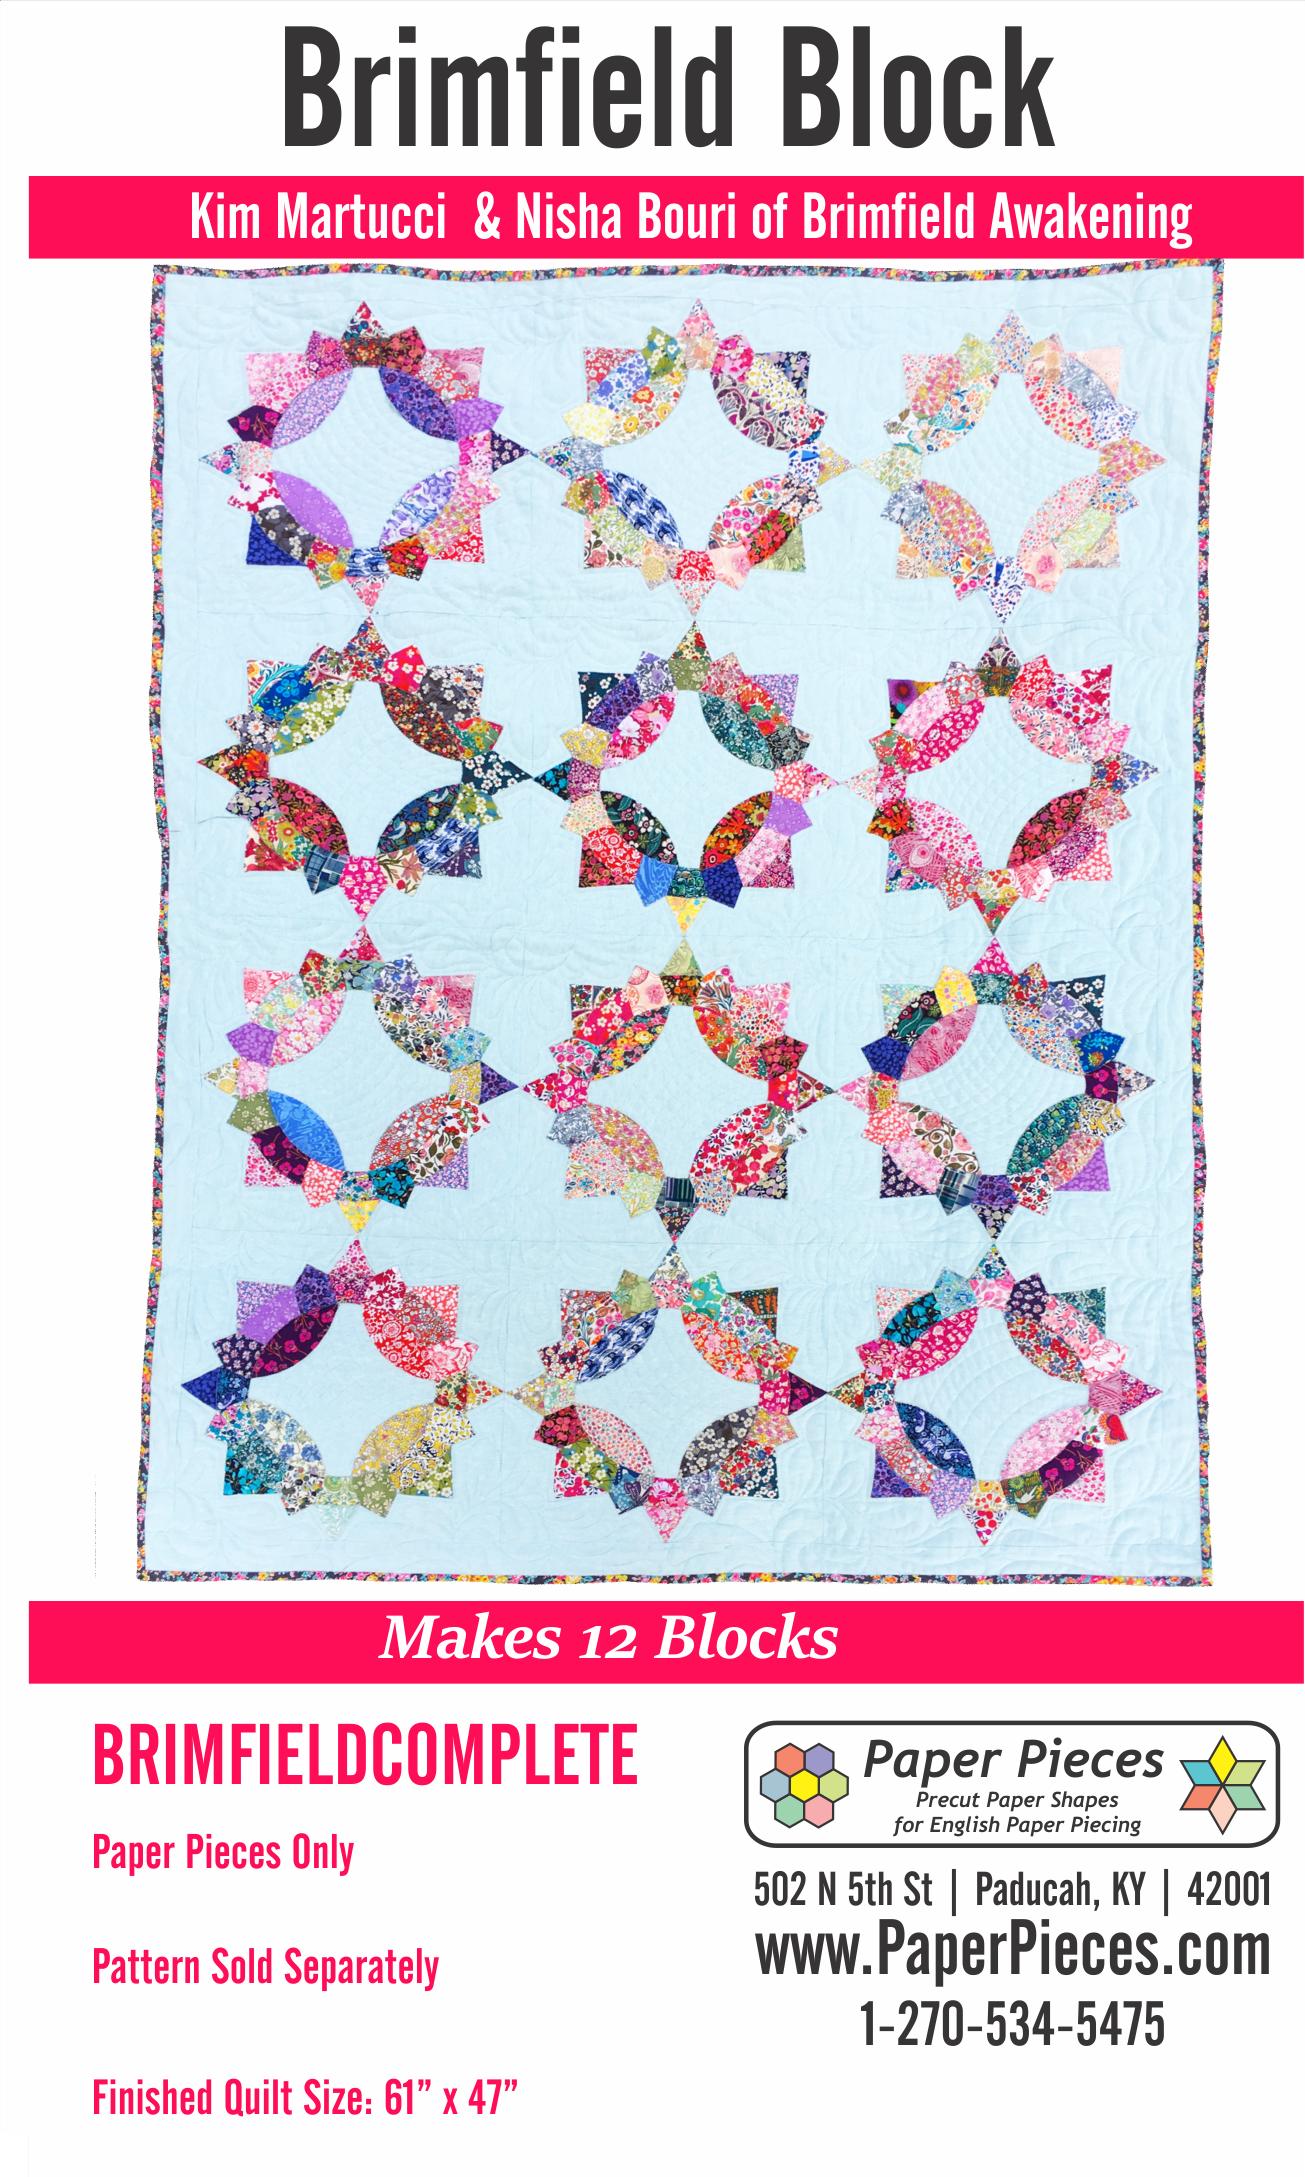 Brimfield Block Complete Piece Pack Makes 12 Blocks